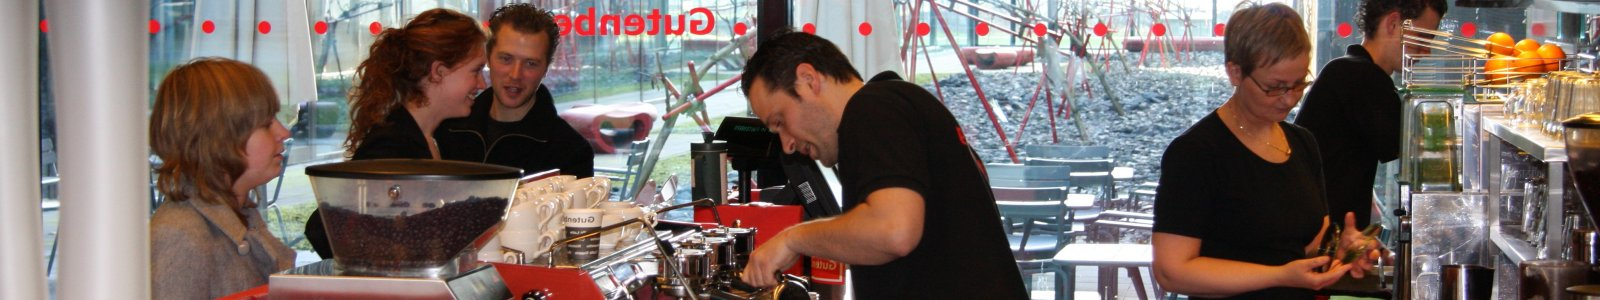 Espressobar Gutenberg